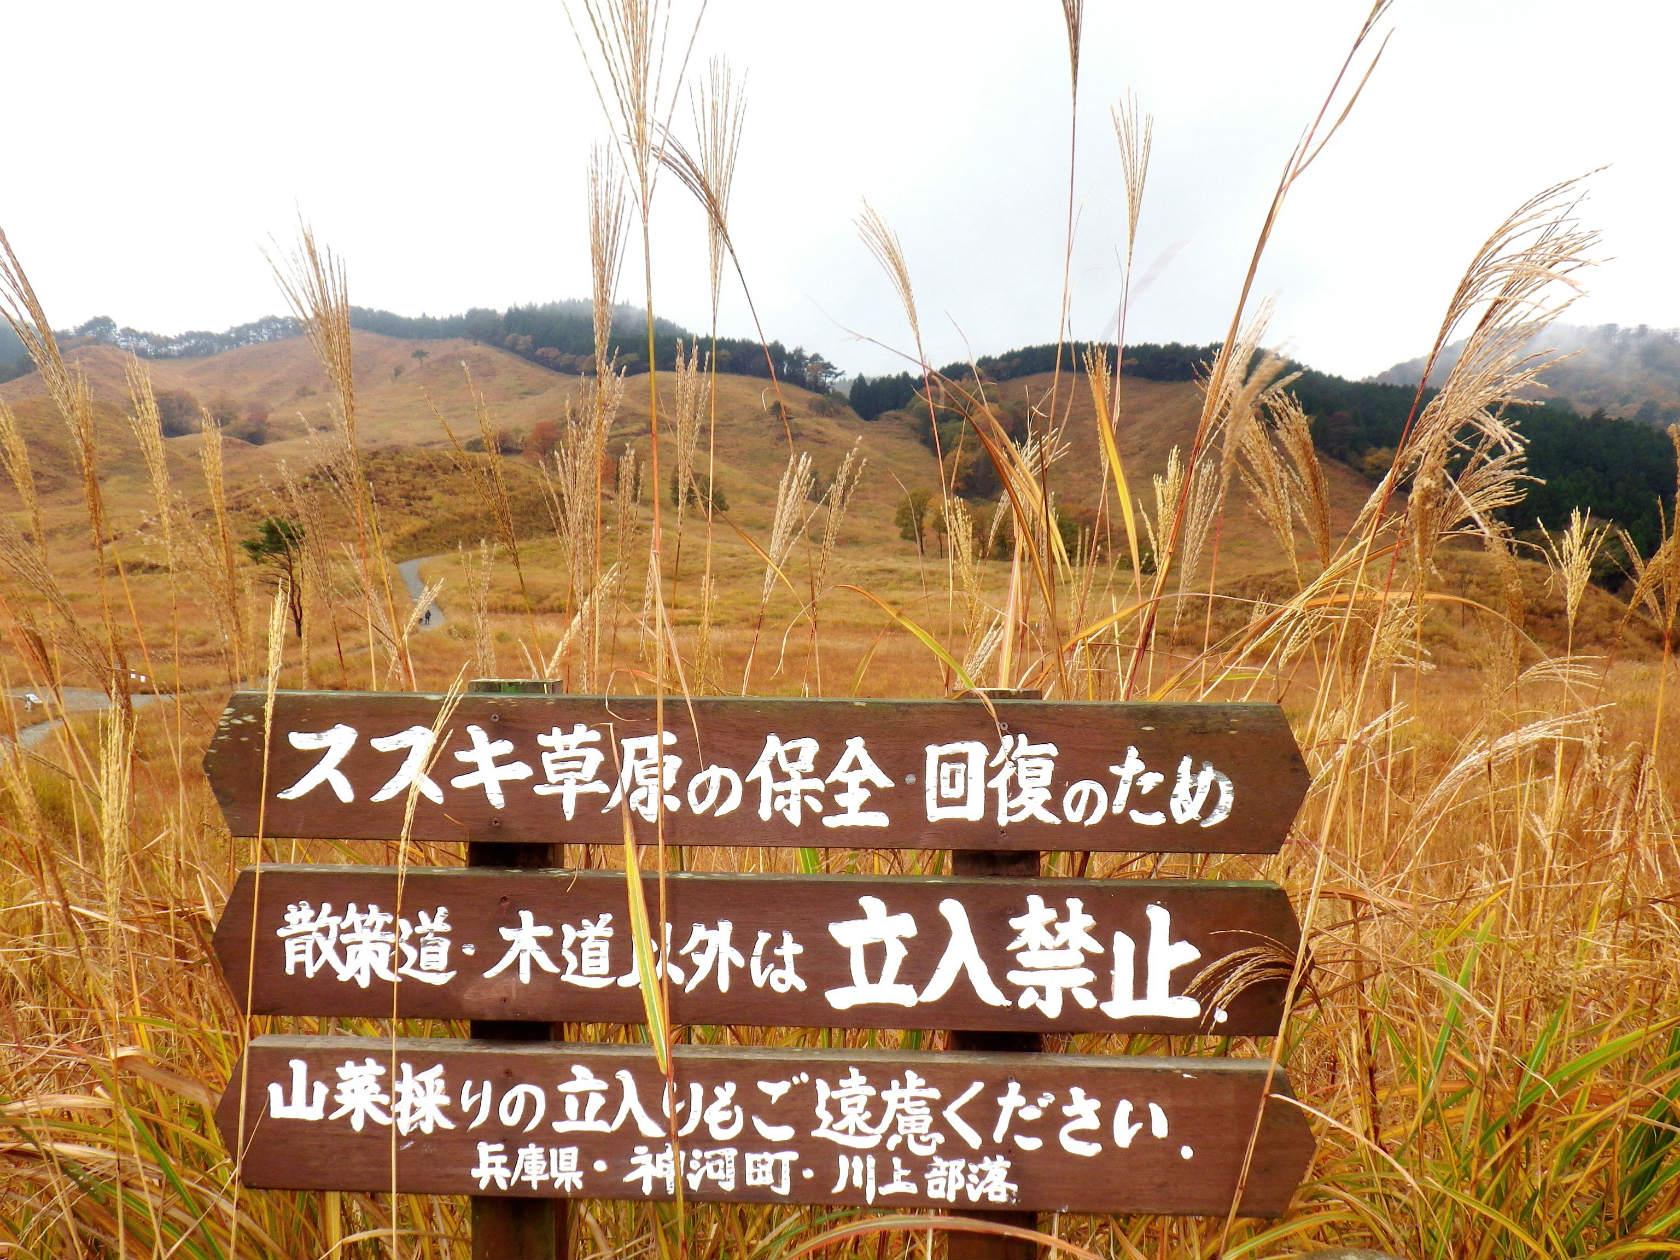 11a ススキ草原保全の立札